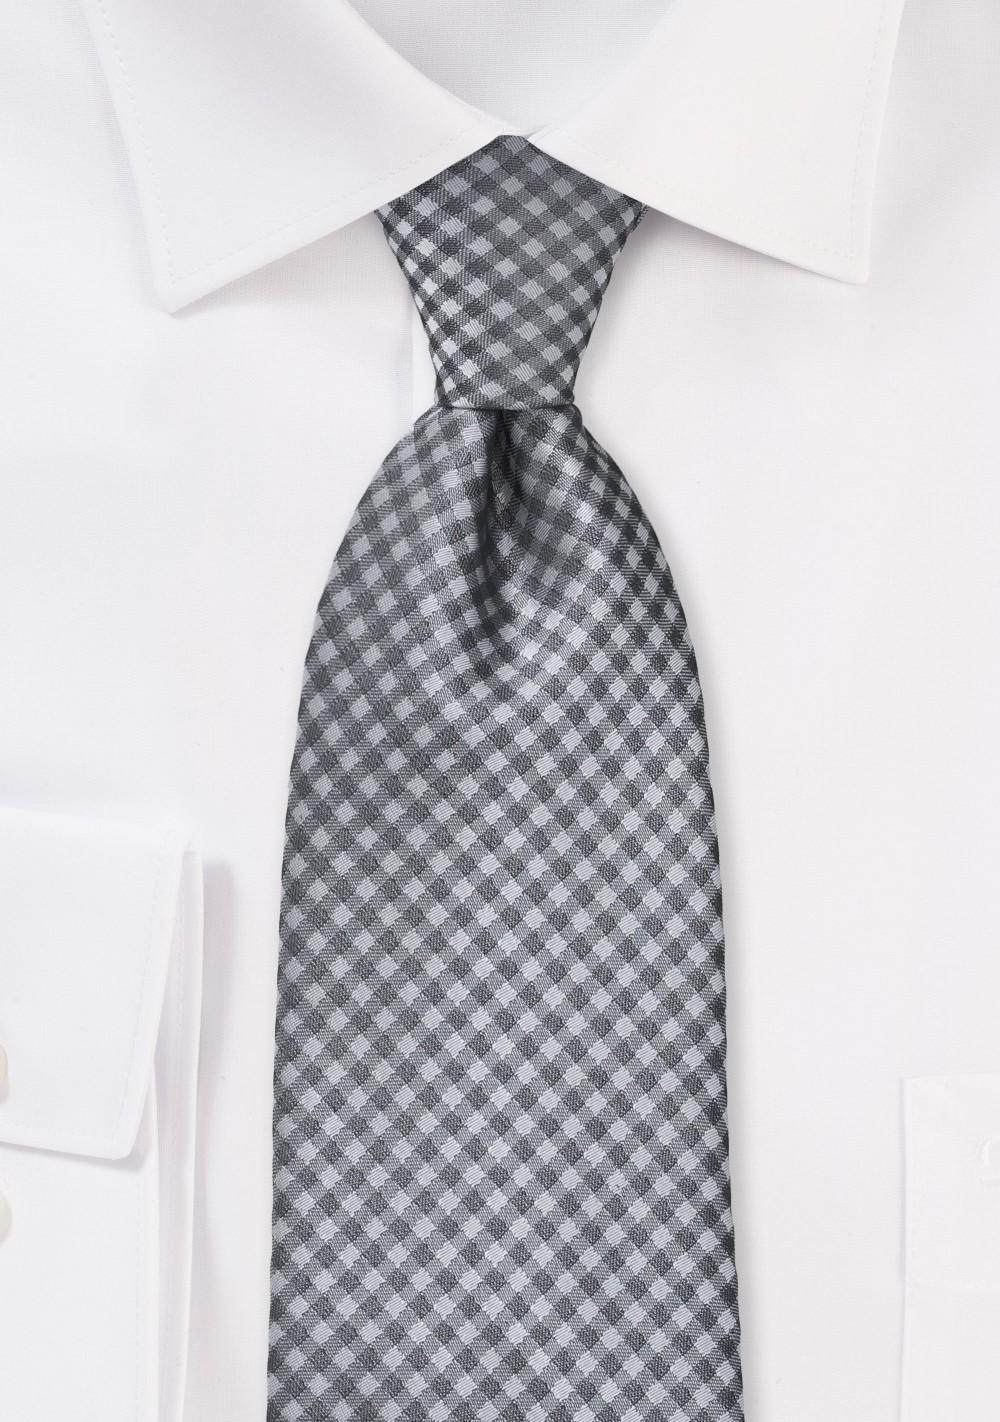 Heather Grey Gingham Tie in XL